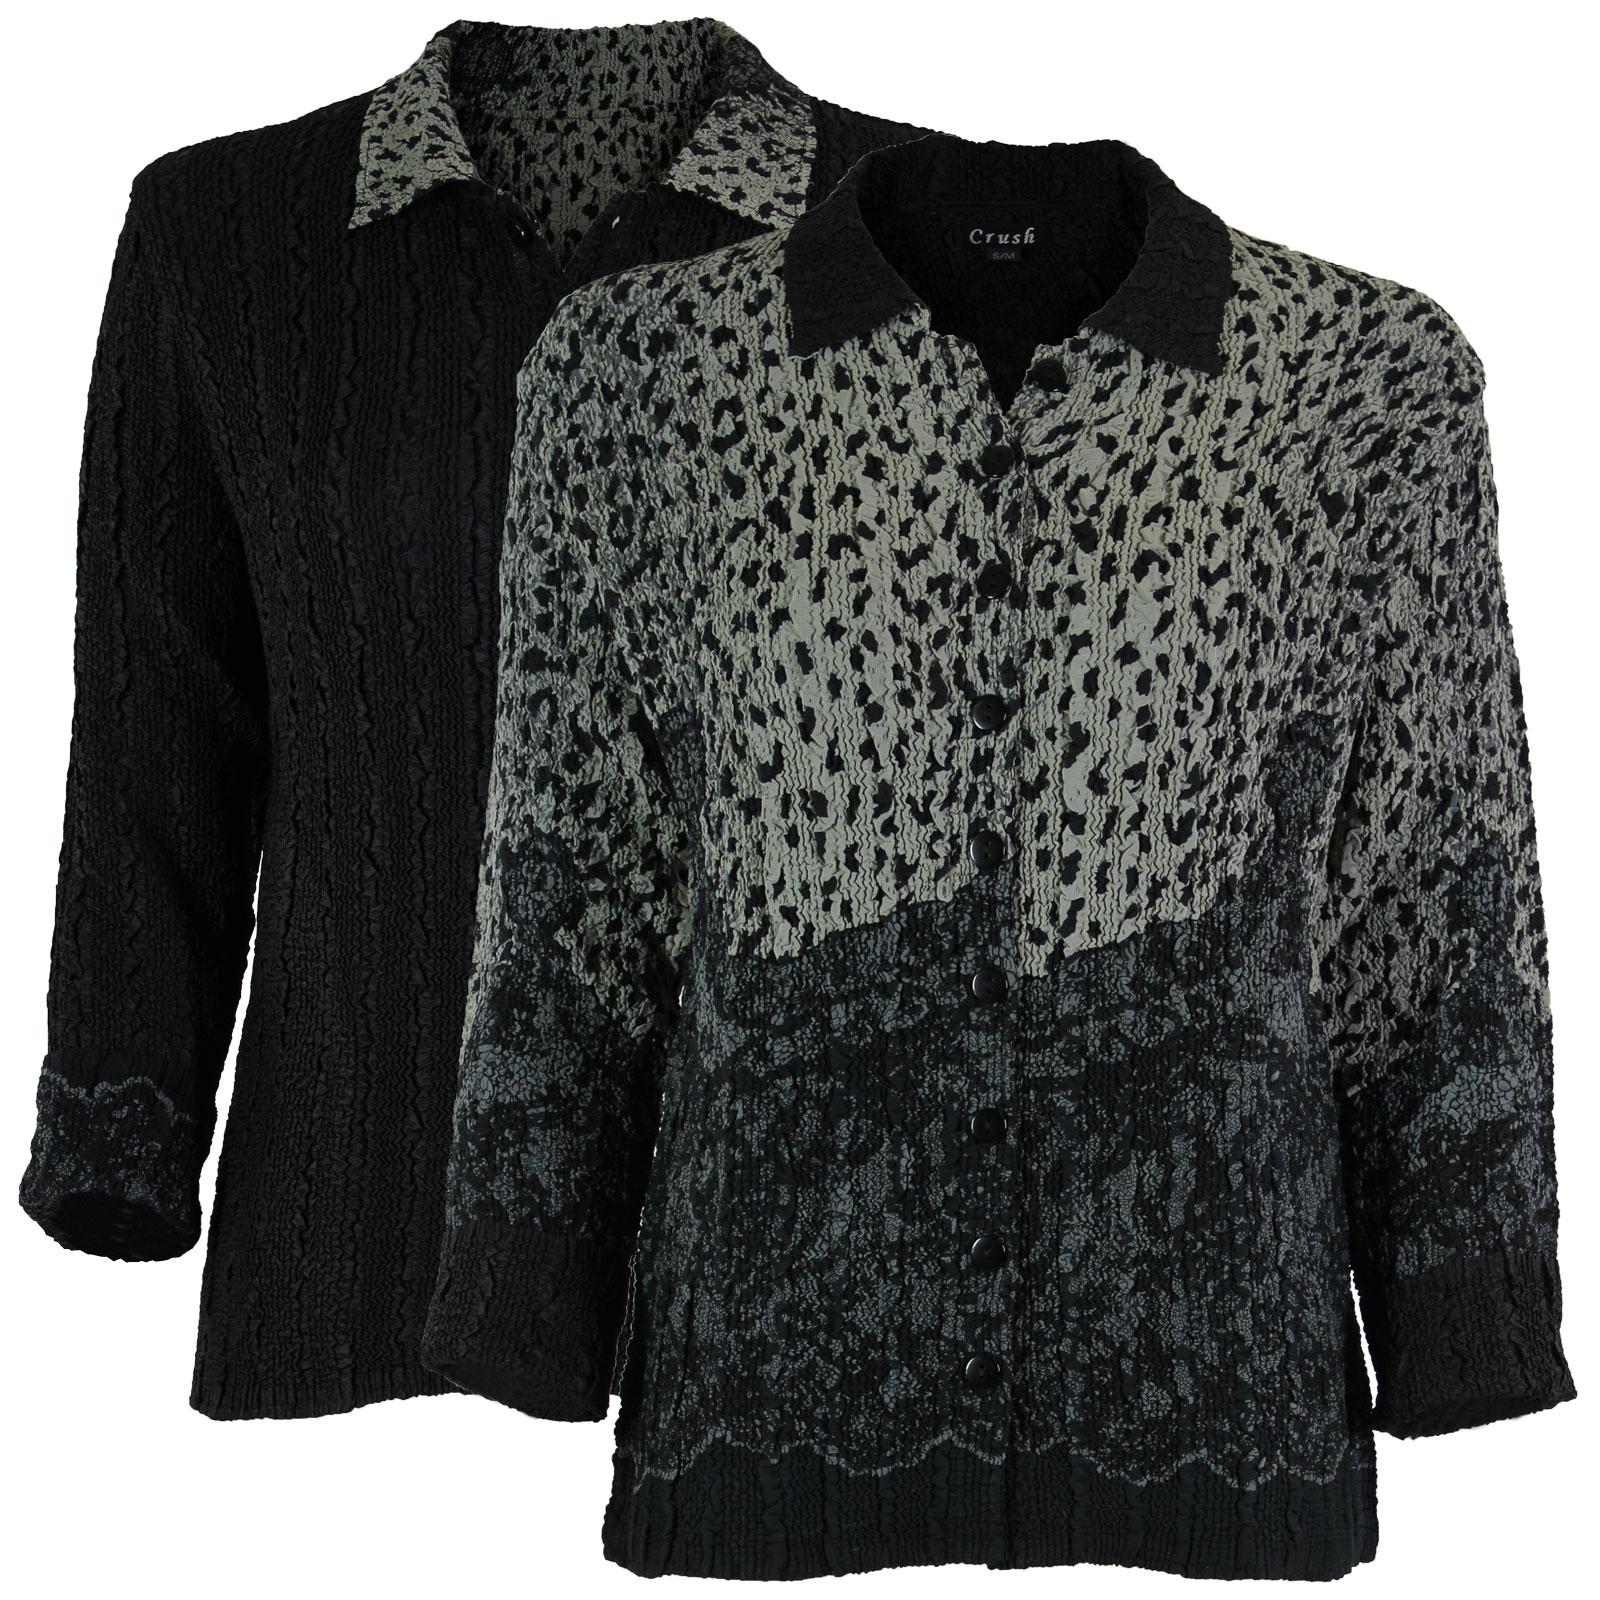 Wholesale Magic Crush - Reversible Jackets #3008 - L-XL